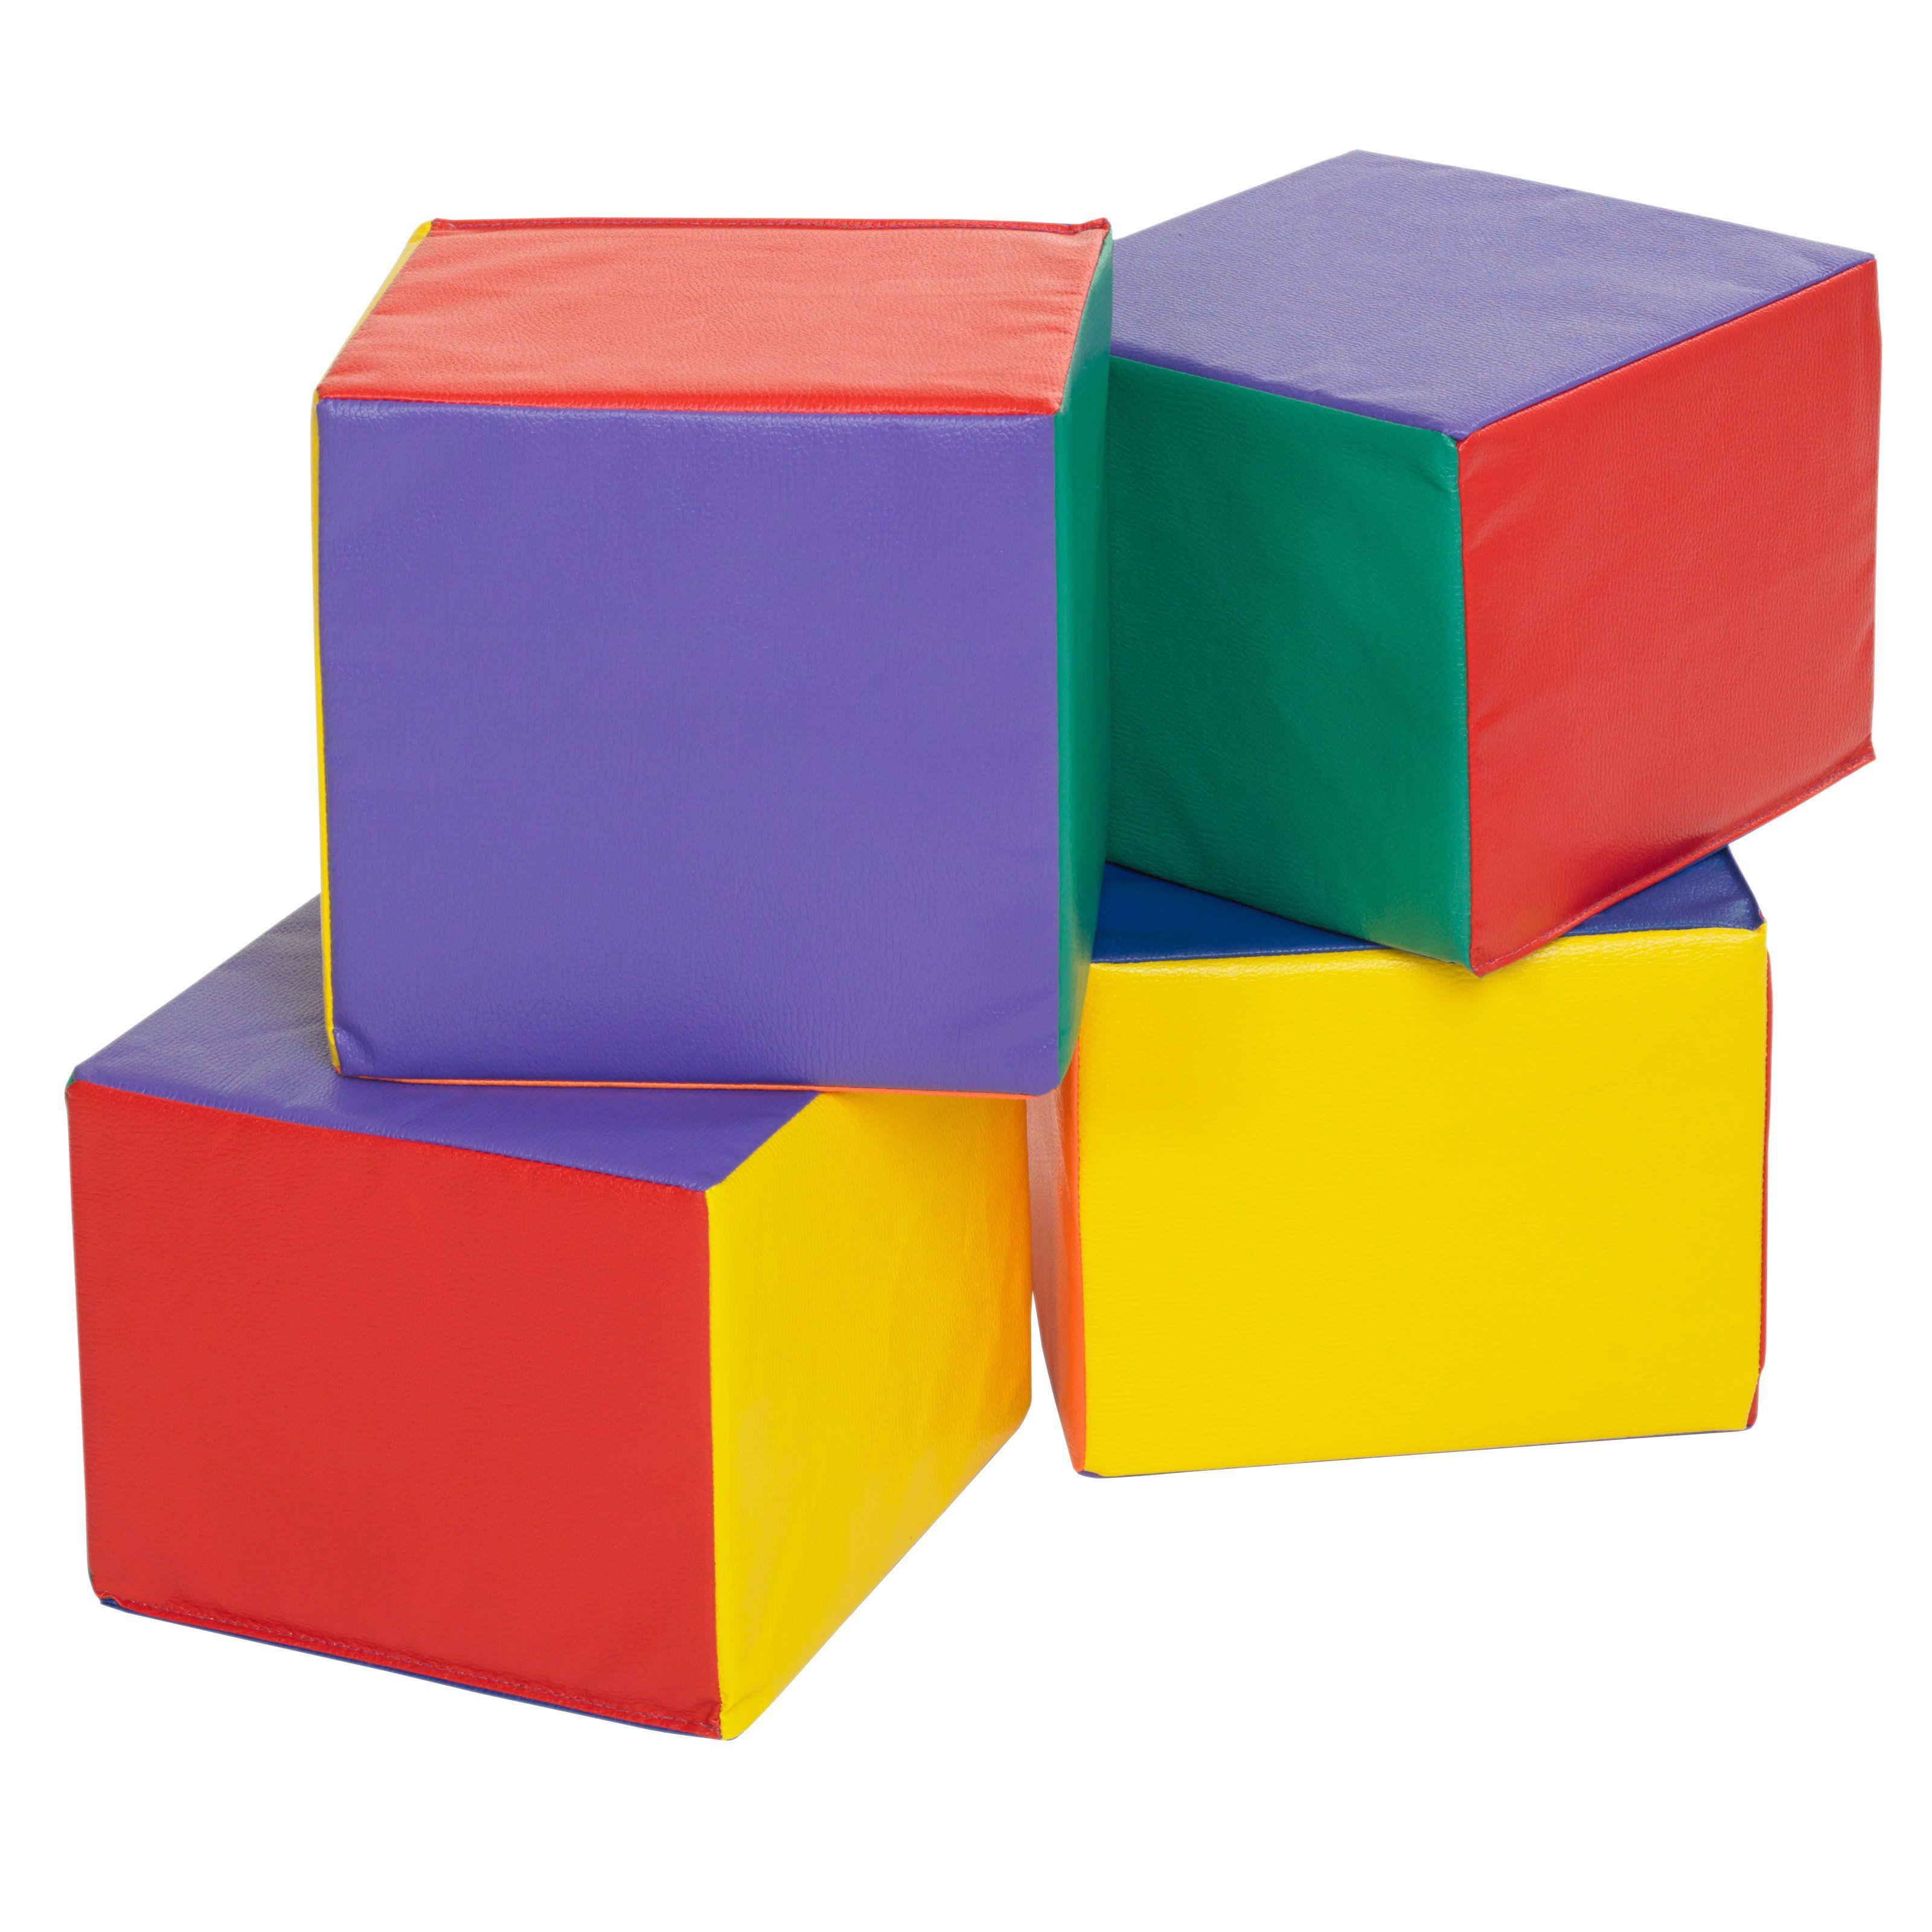 ECR4KIDS Softzone 4Piece Carry Me Cube Child ELR